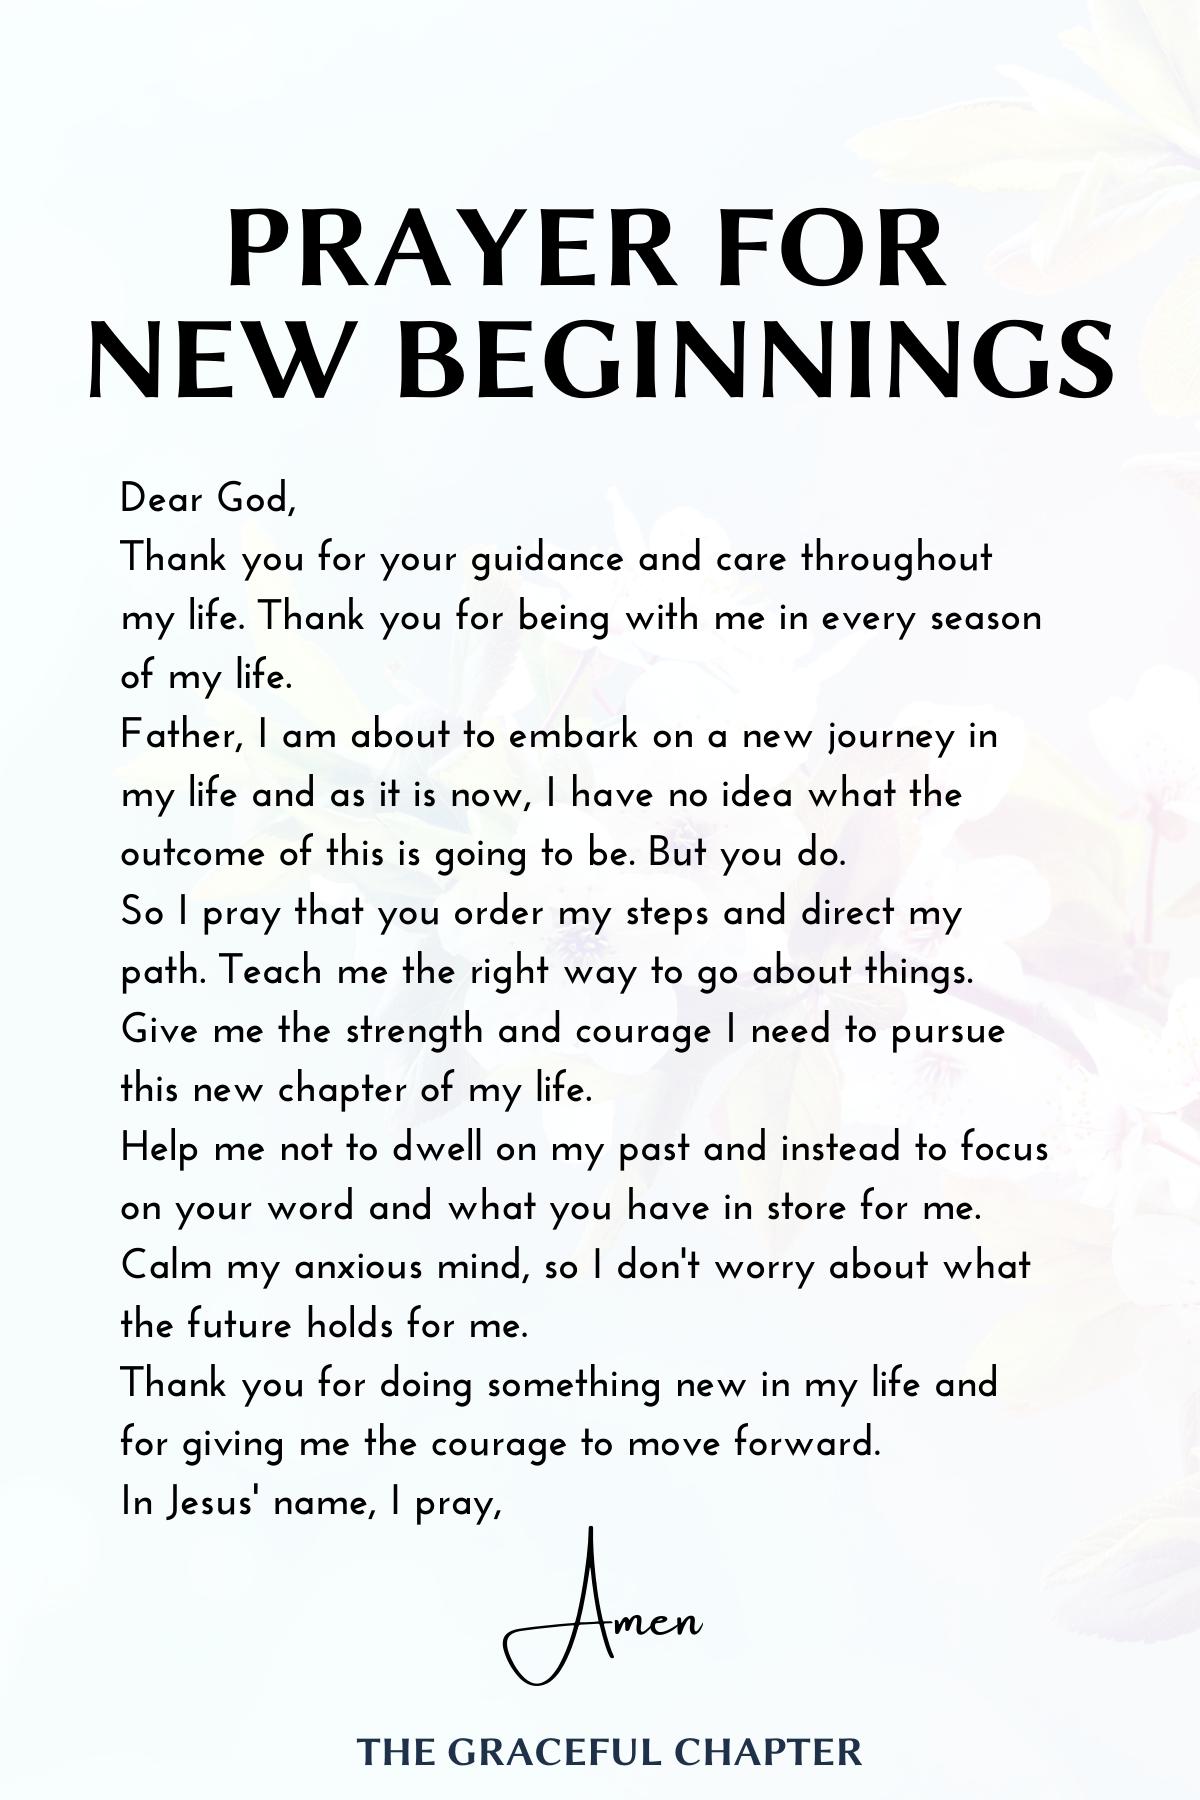 30 Encouraging Bible Verses On New Beginnings (Wit